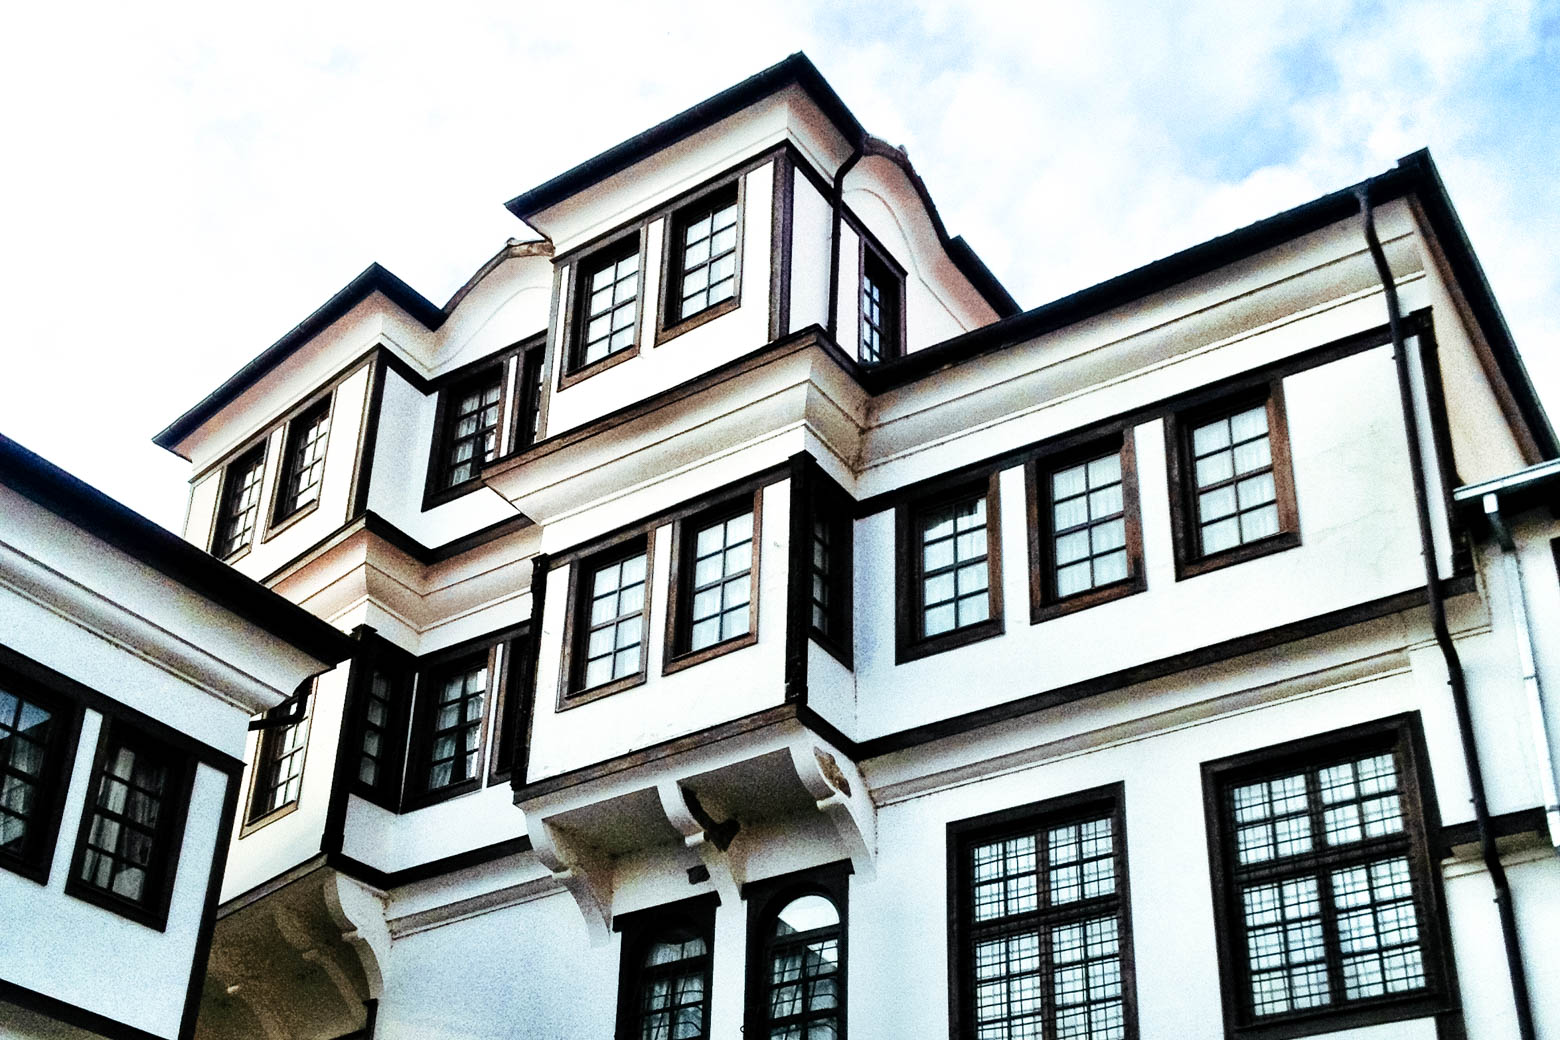 Ottoman House in Ohrid